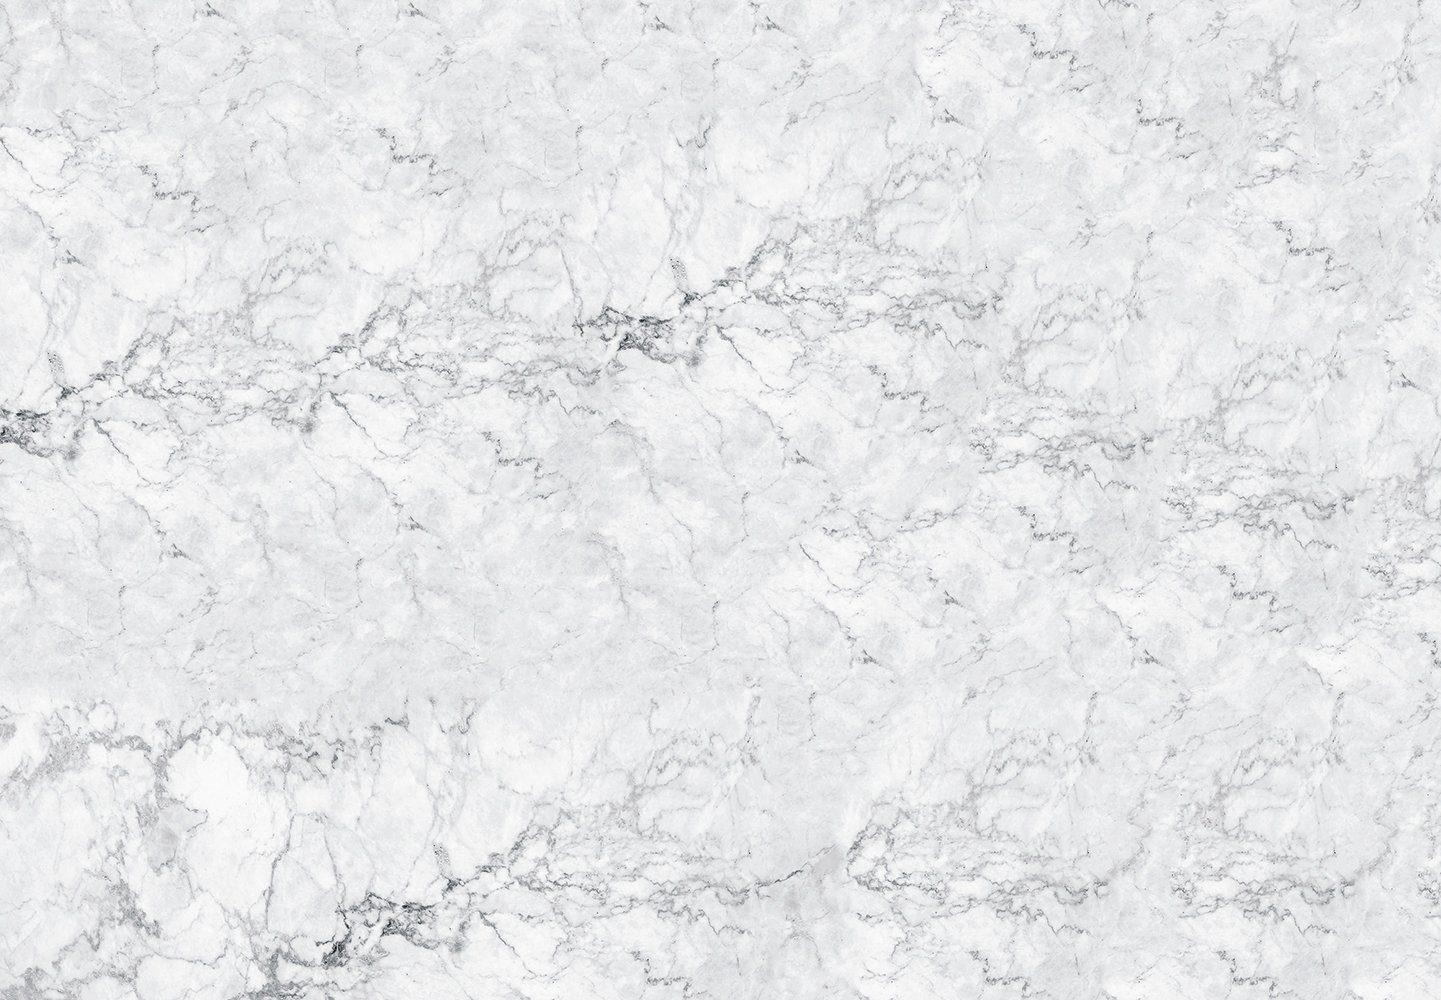 Vliestapete »White Marble«, 366x127cm, 4-teilig